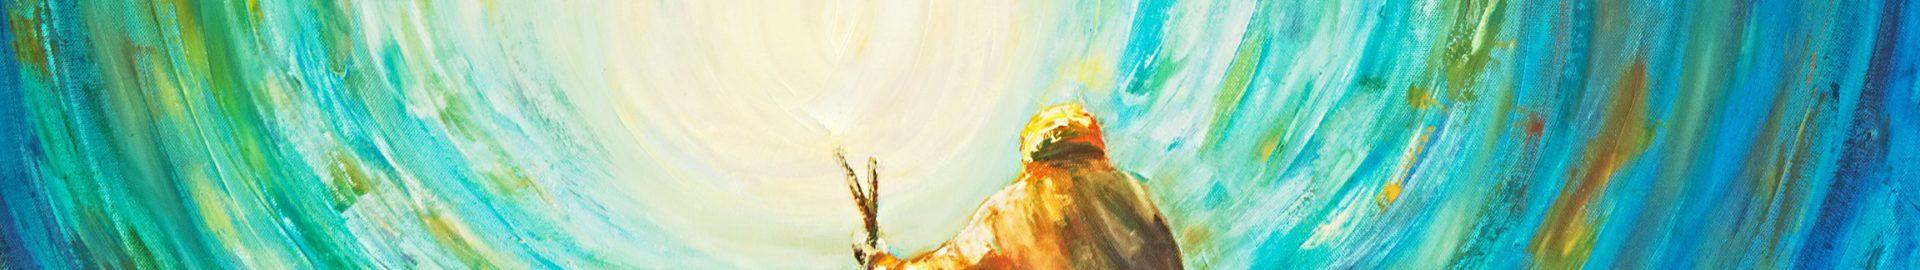 sufi-pfad-licht-painting-olesya